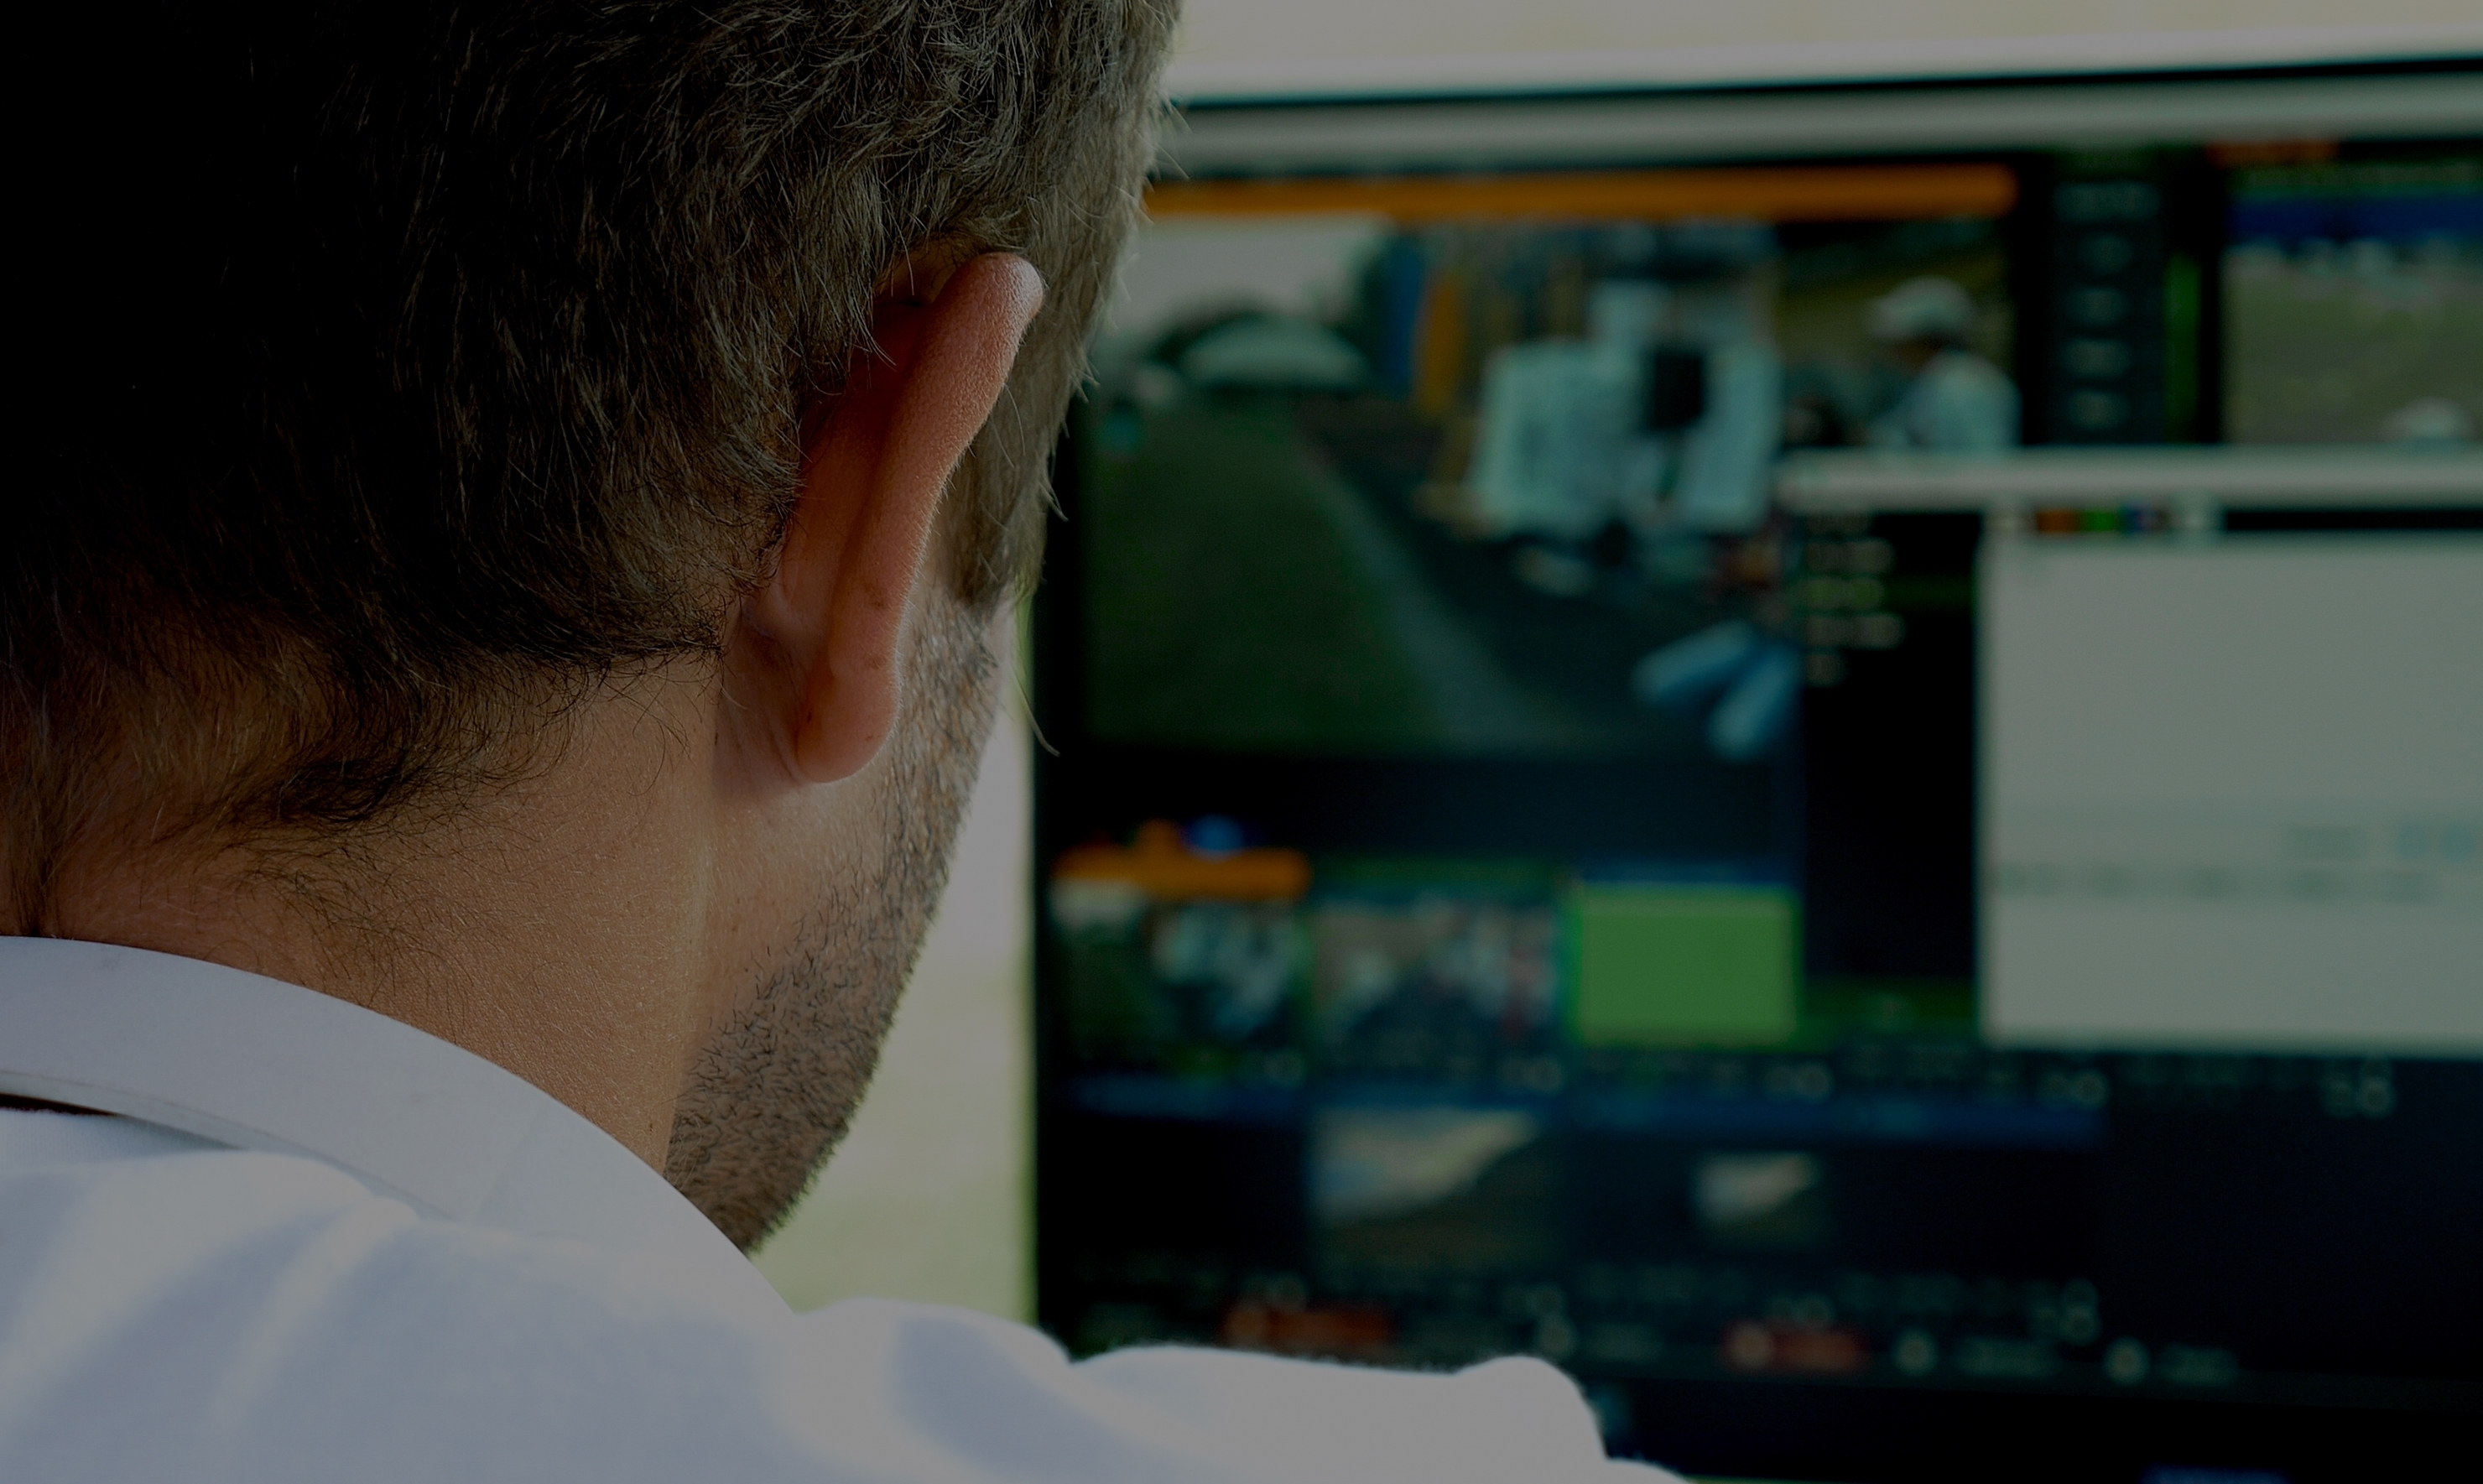 Video broadcast editor with headphones at screen 9 UZJNUR